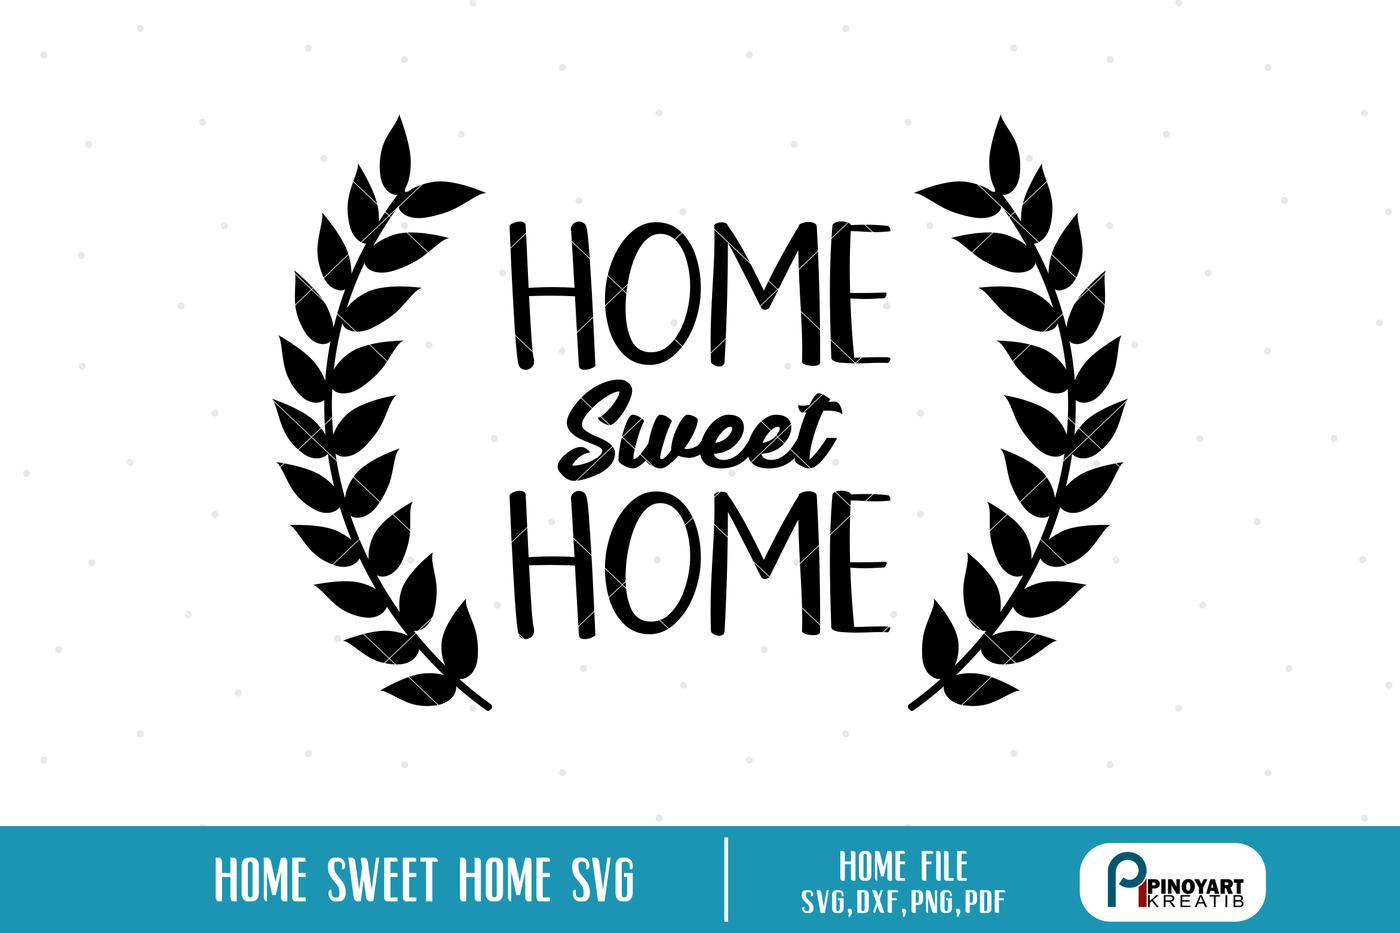 Home Sweet Home Svg Home Svg House Svg Family Svg Wreath Svg